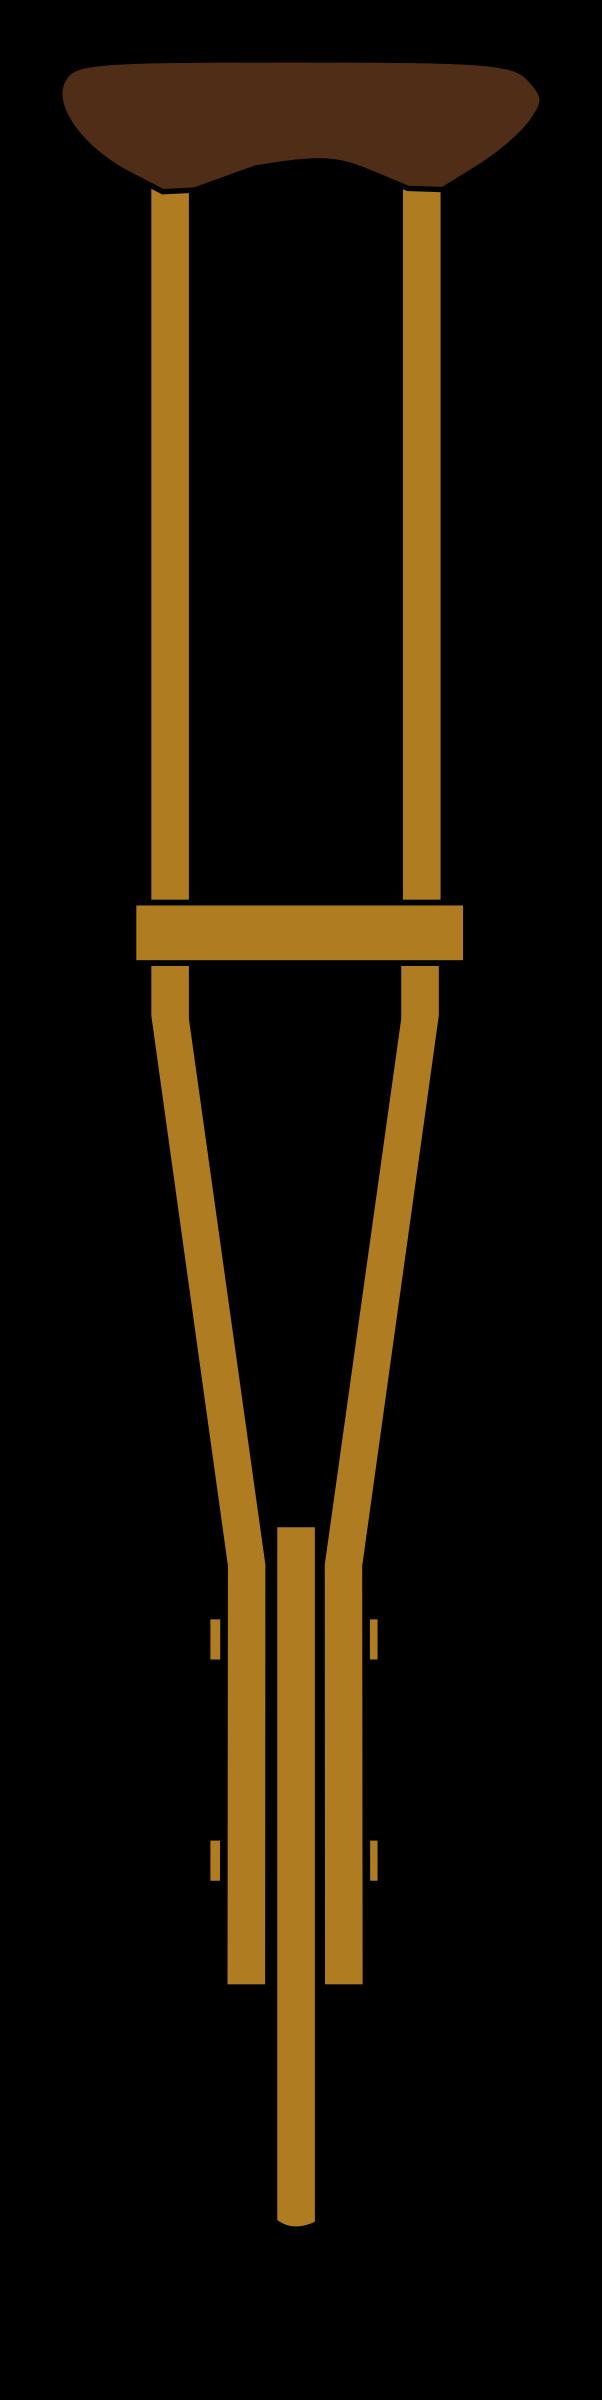 Clipart crutches clip art freeuse download Free Crutches Cliparts, Download Free Clip Art, Free Clip Art on ... clip art freeuse download